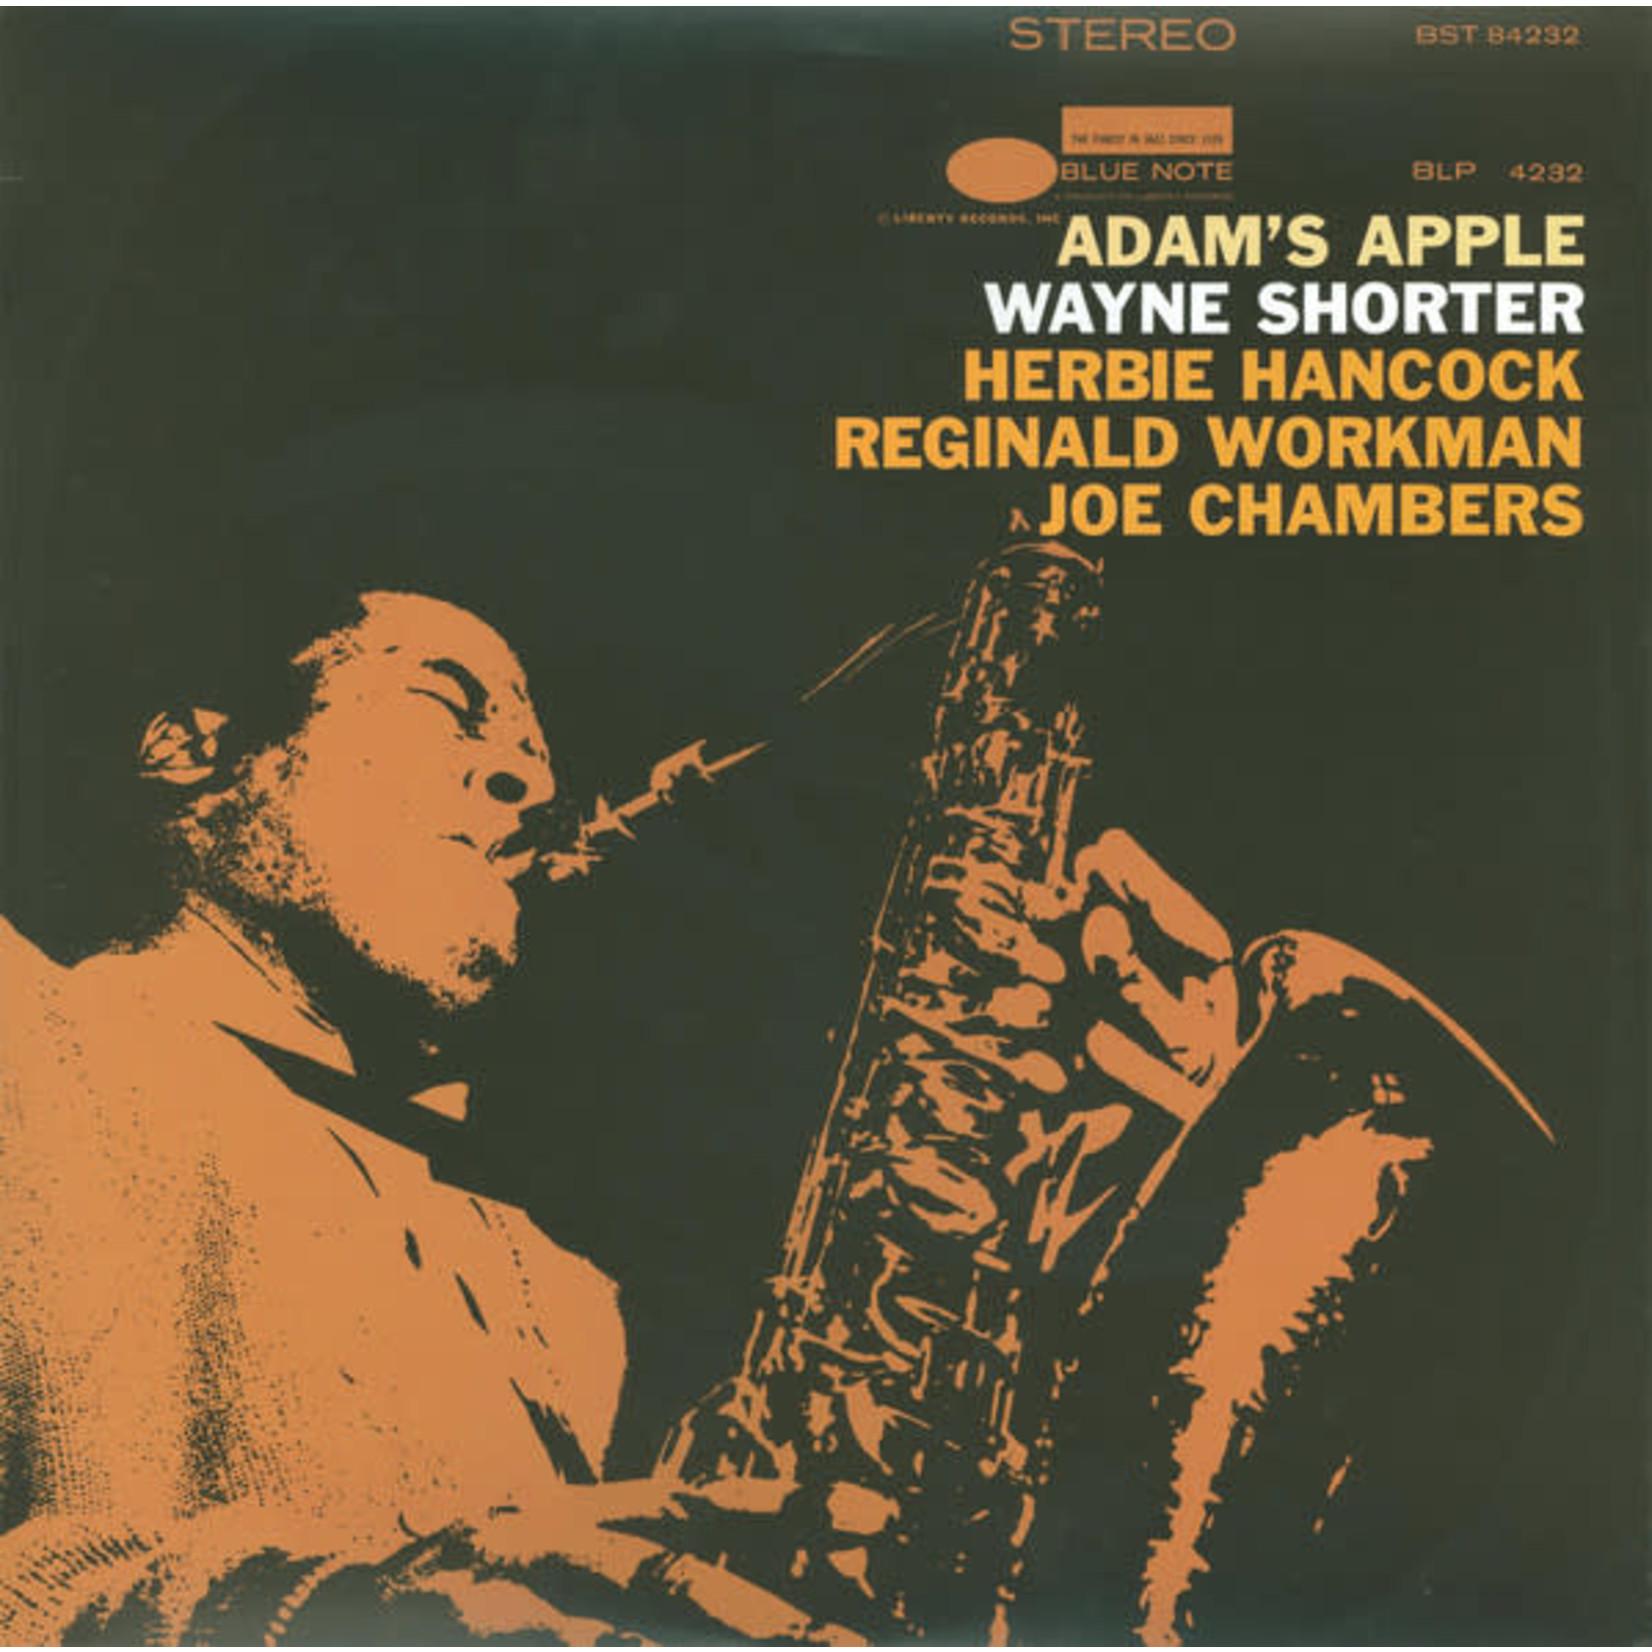 [New] Shorter, Wayne: Adam's Apple (Blue Note 75th Anniversary Series)